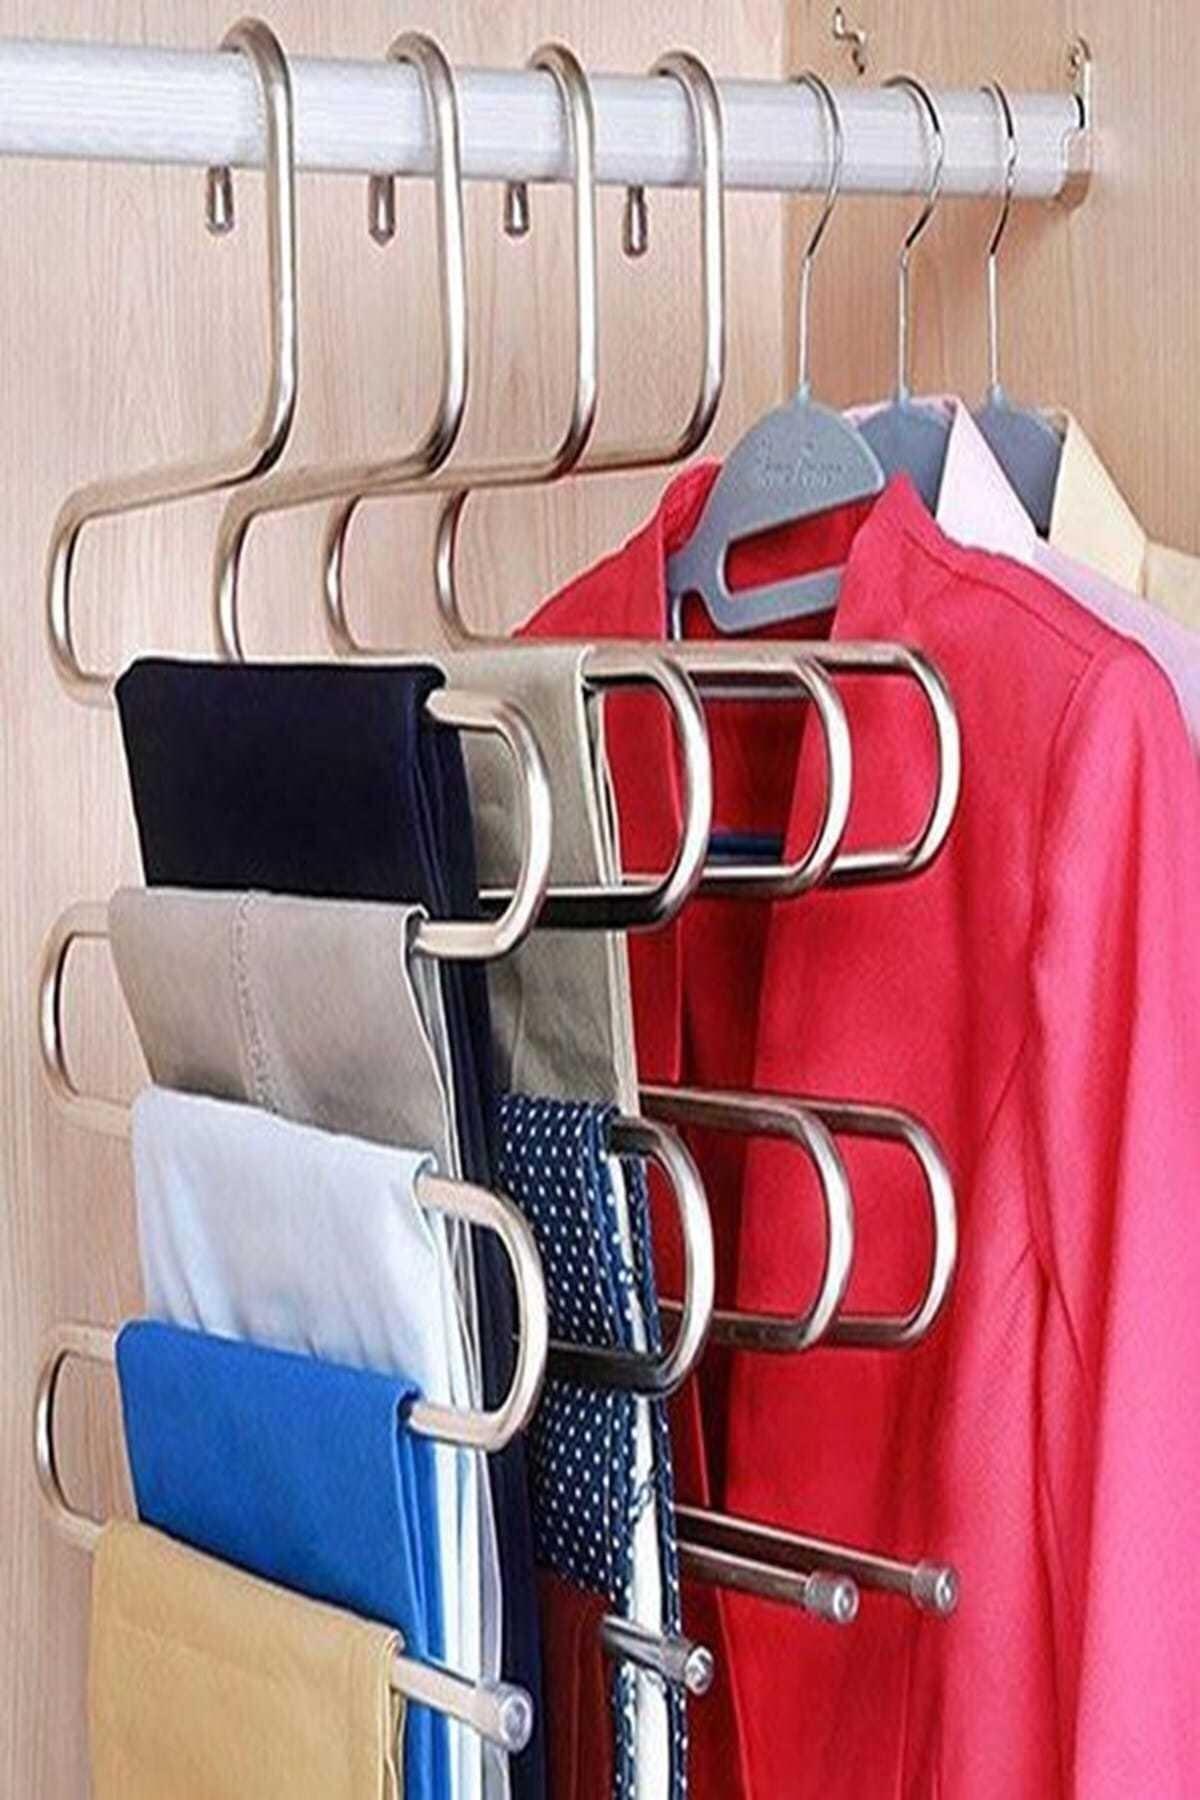 Kitchen Life 5 Katlı Metal Pantolon Eşarp Askısı 1